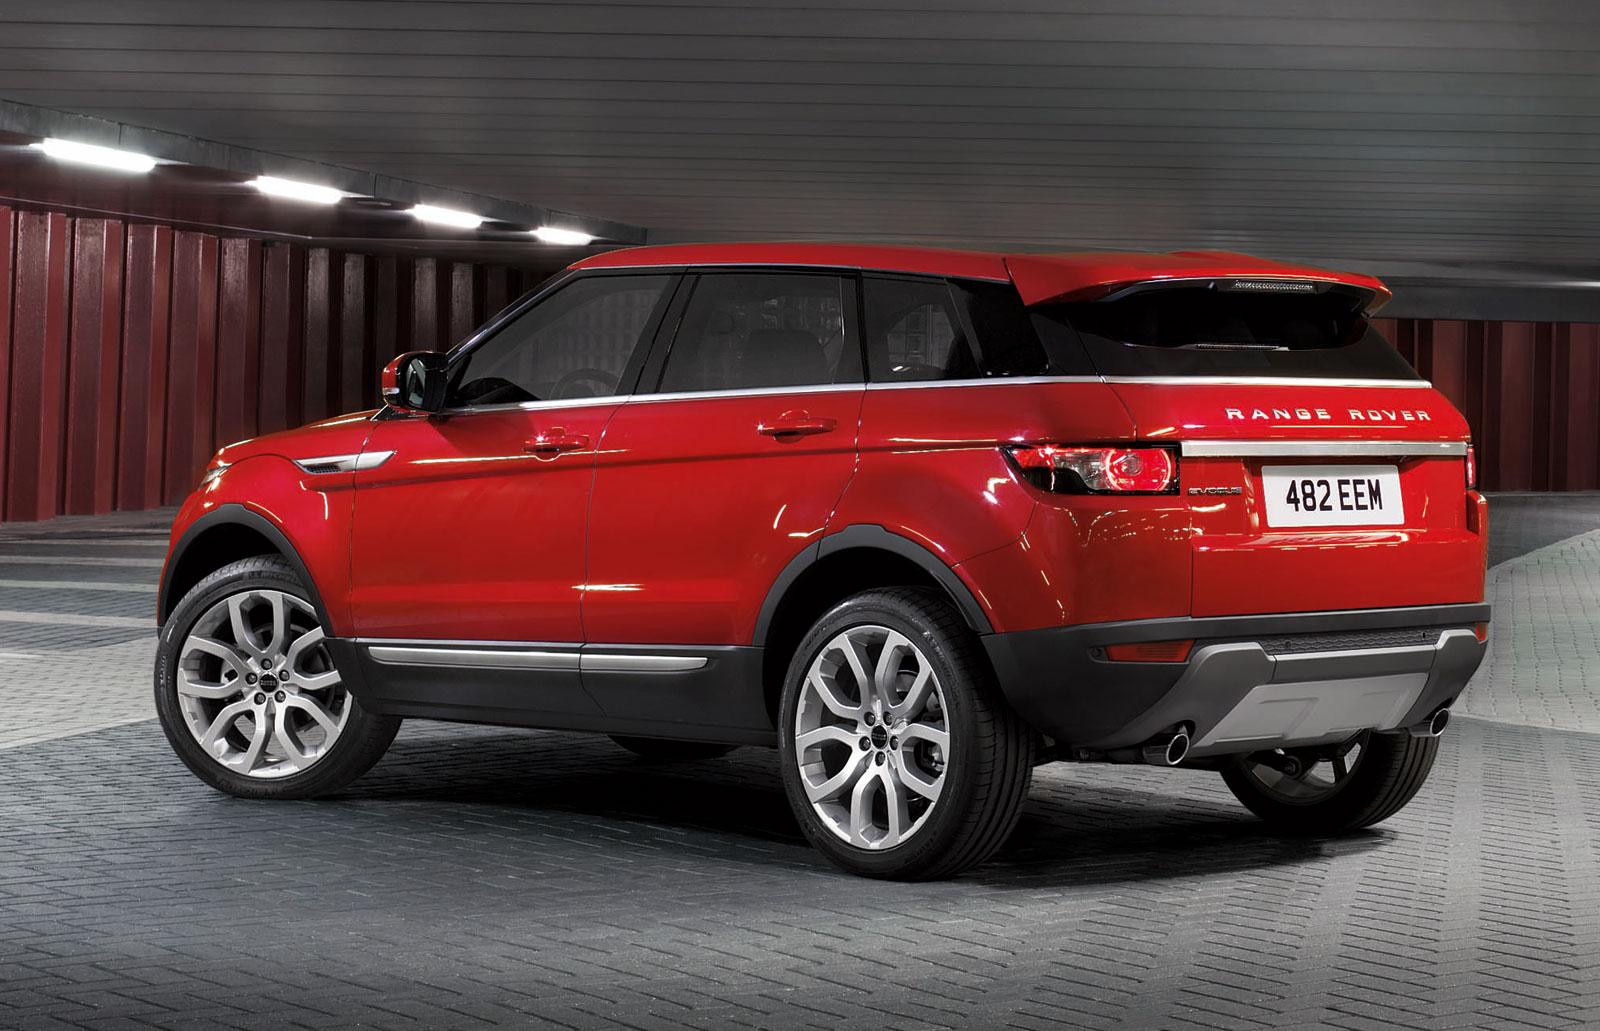 Land Rover Evoque 26 Free Hd Wallpaper